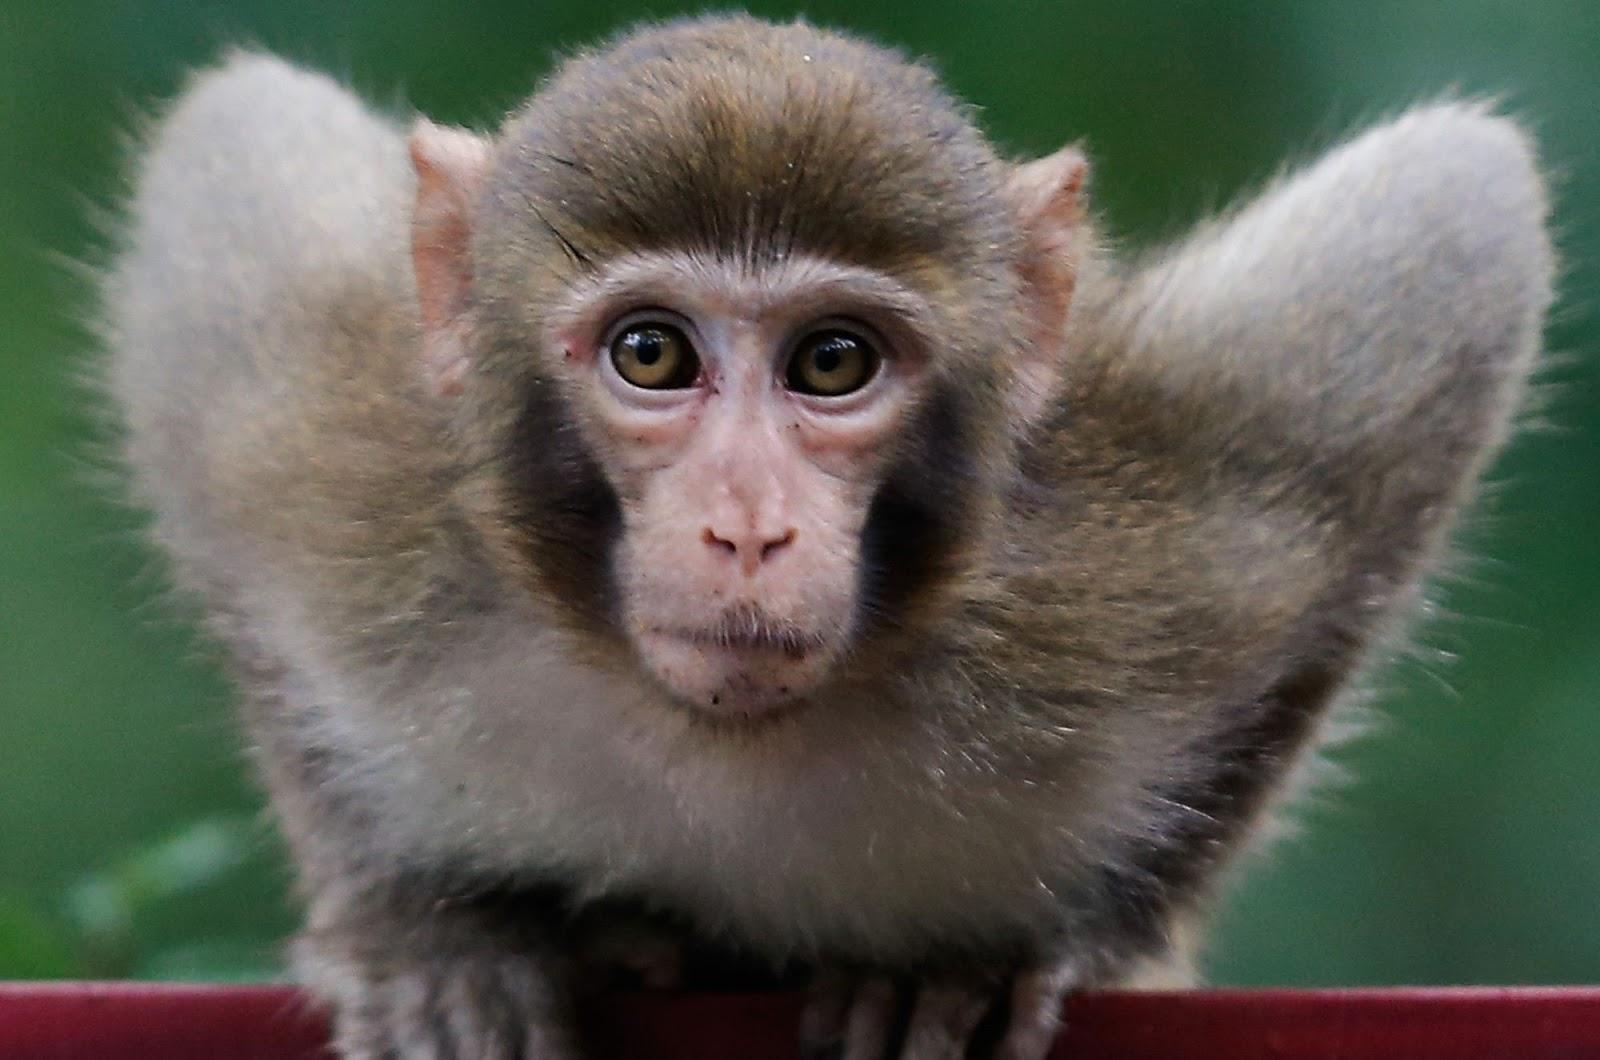 Ketahui 11 Gambar Monyet Paling Heboh